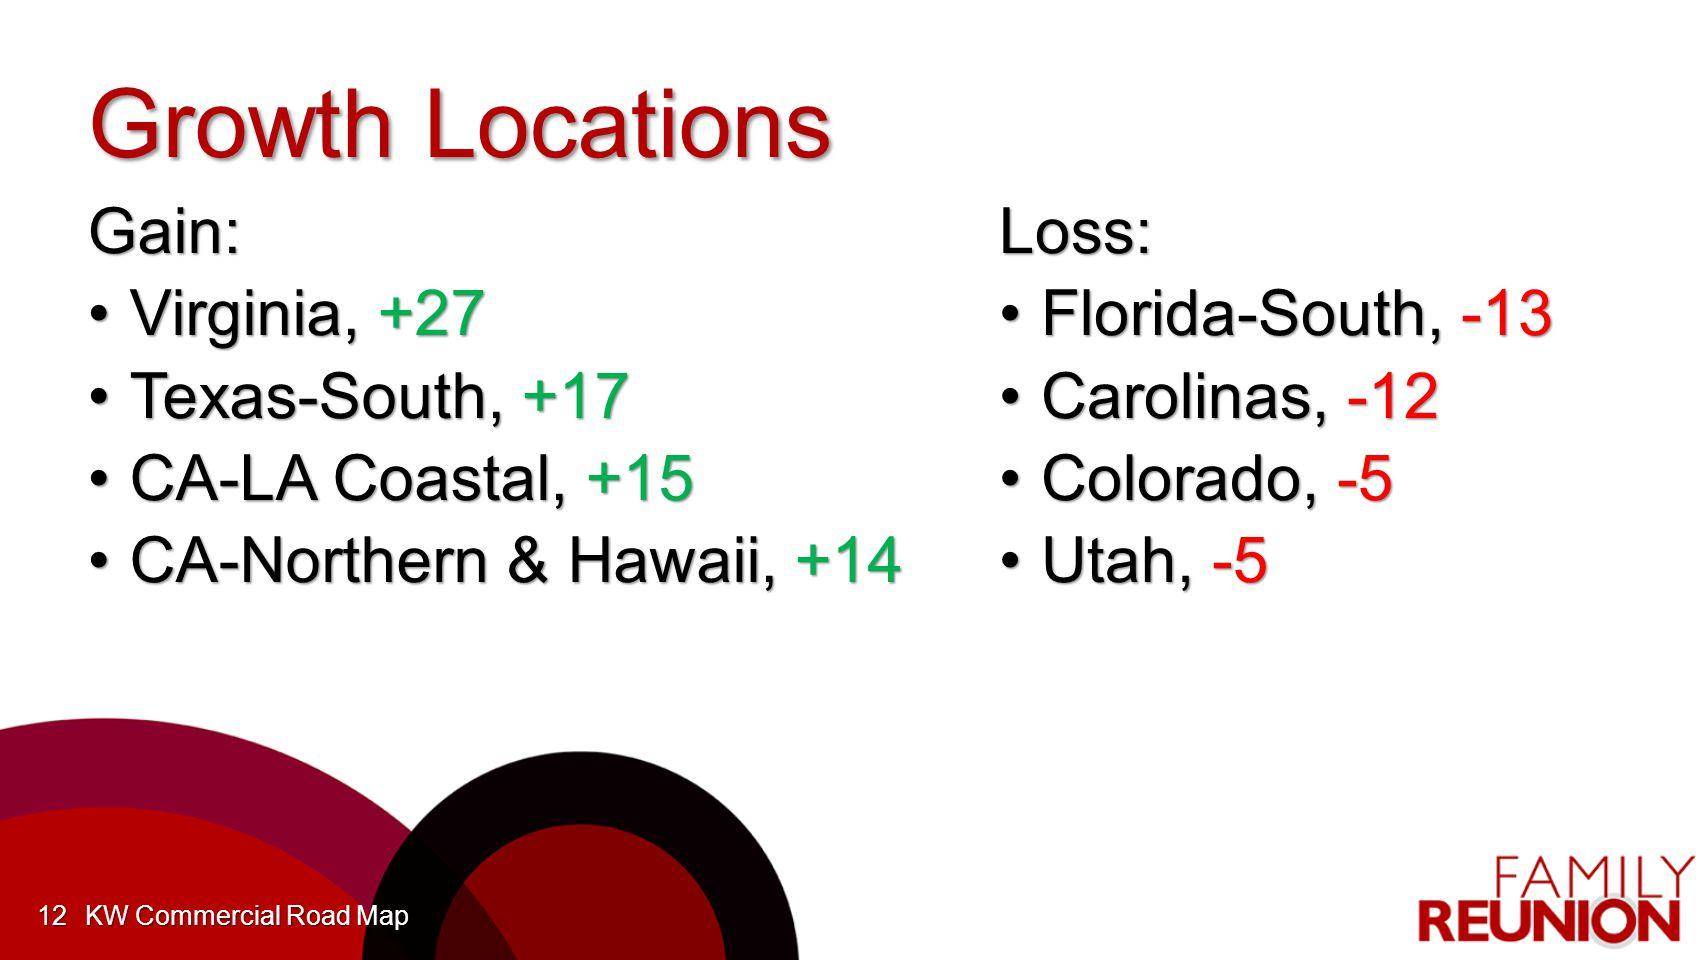 Growth Locations Gain: Virginia, +27Virginia, +27 Texas-South, +17Texas-South, +17 CA-LA Coastal, +15CA-LA Coastal, +15 CA-Northern & Hawaii, +14CA-Northern & Hawaii, +14 KW Commercial Road Map12 Loss: Florida-South, -13Florida-South, -13 Carolinas, -12Carolinas, -12 Colorado, -5Colorado, -5 Utah, -5Utah, -5